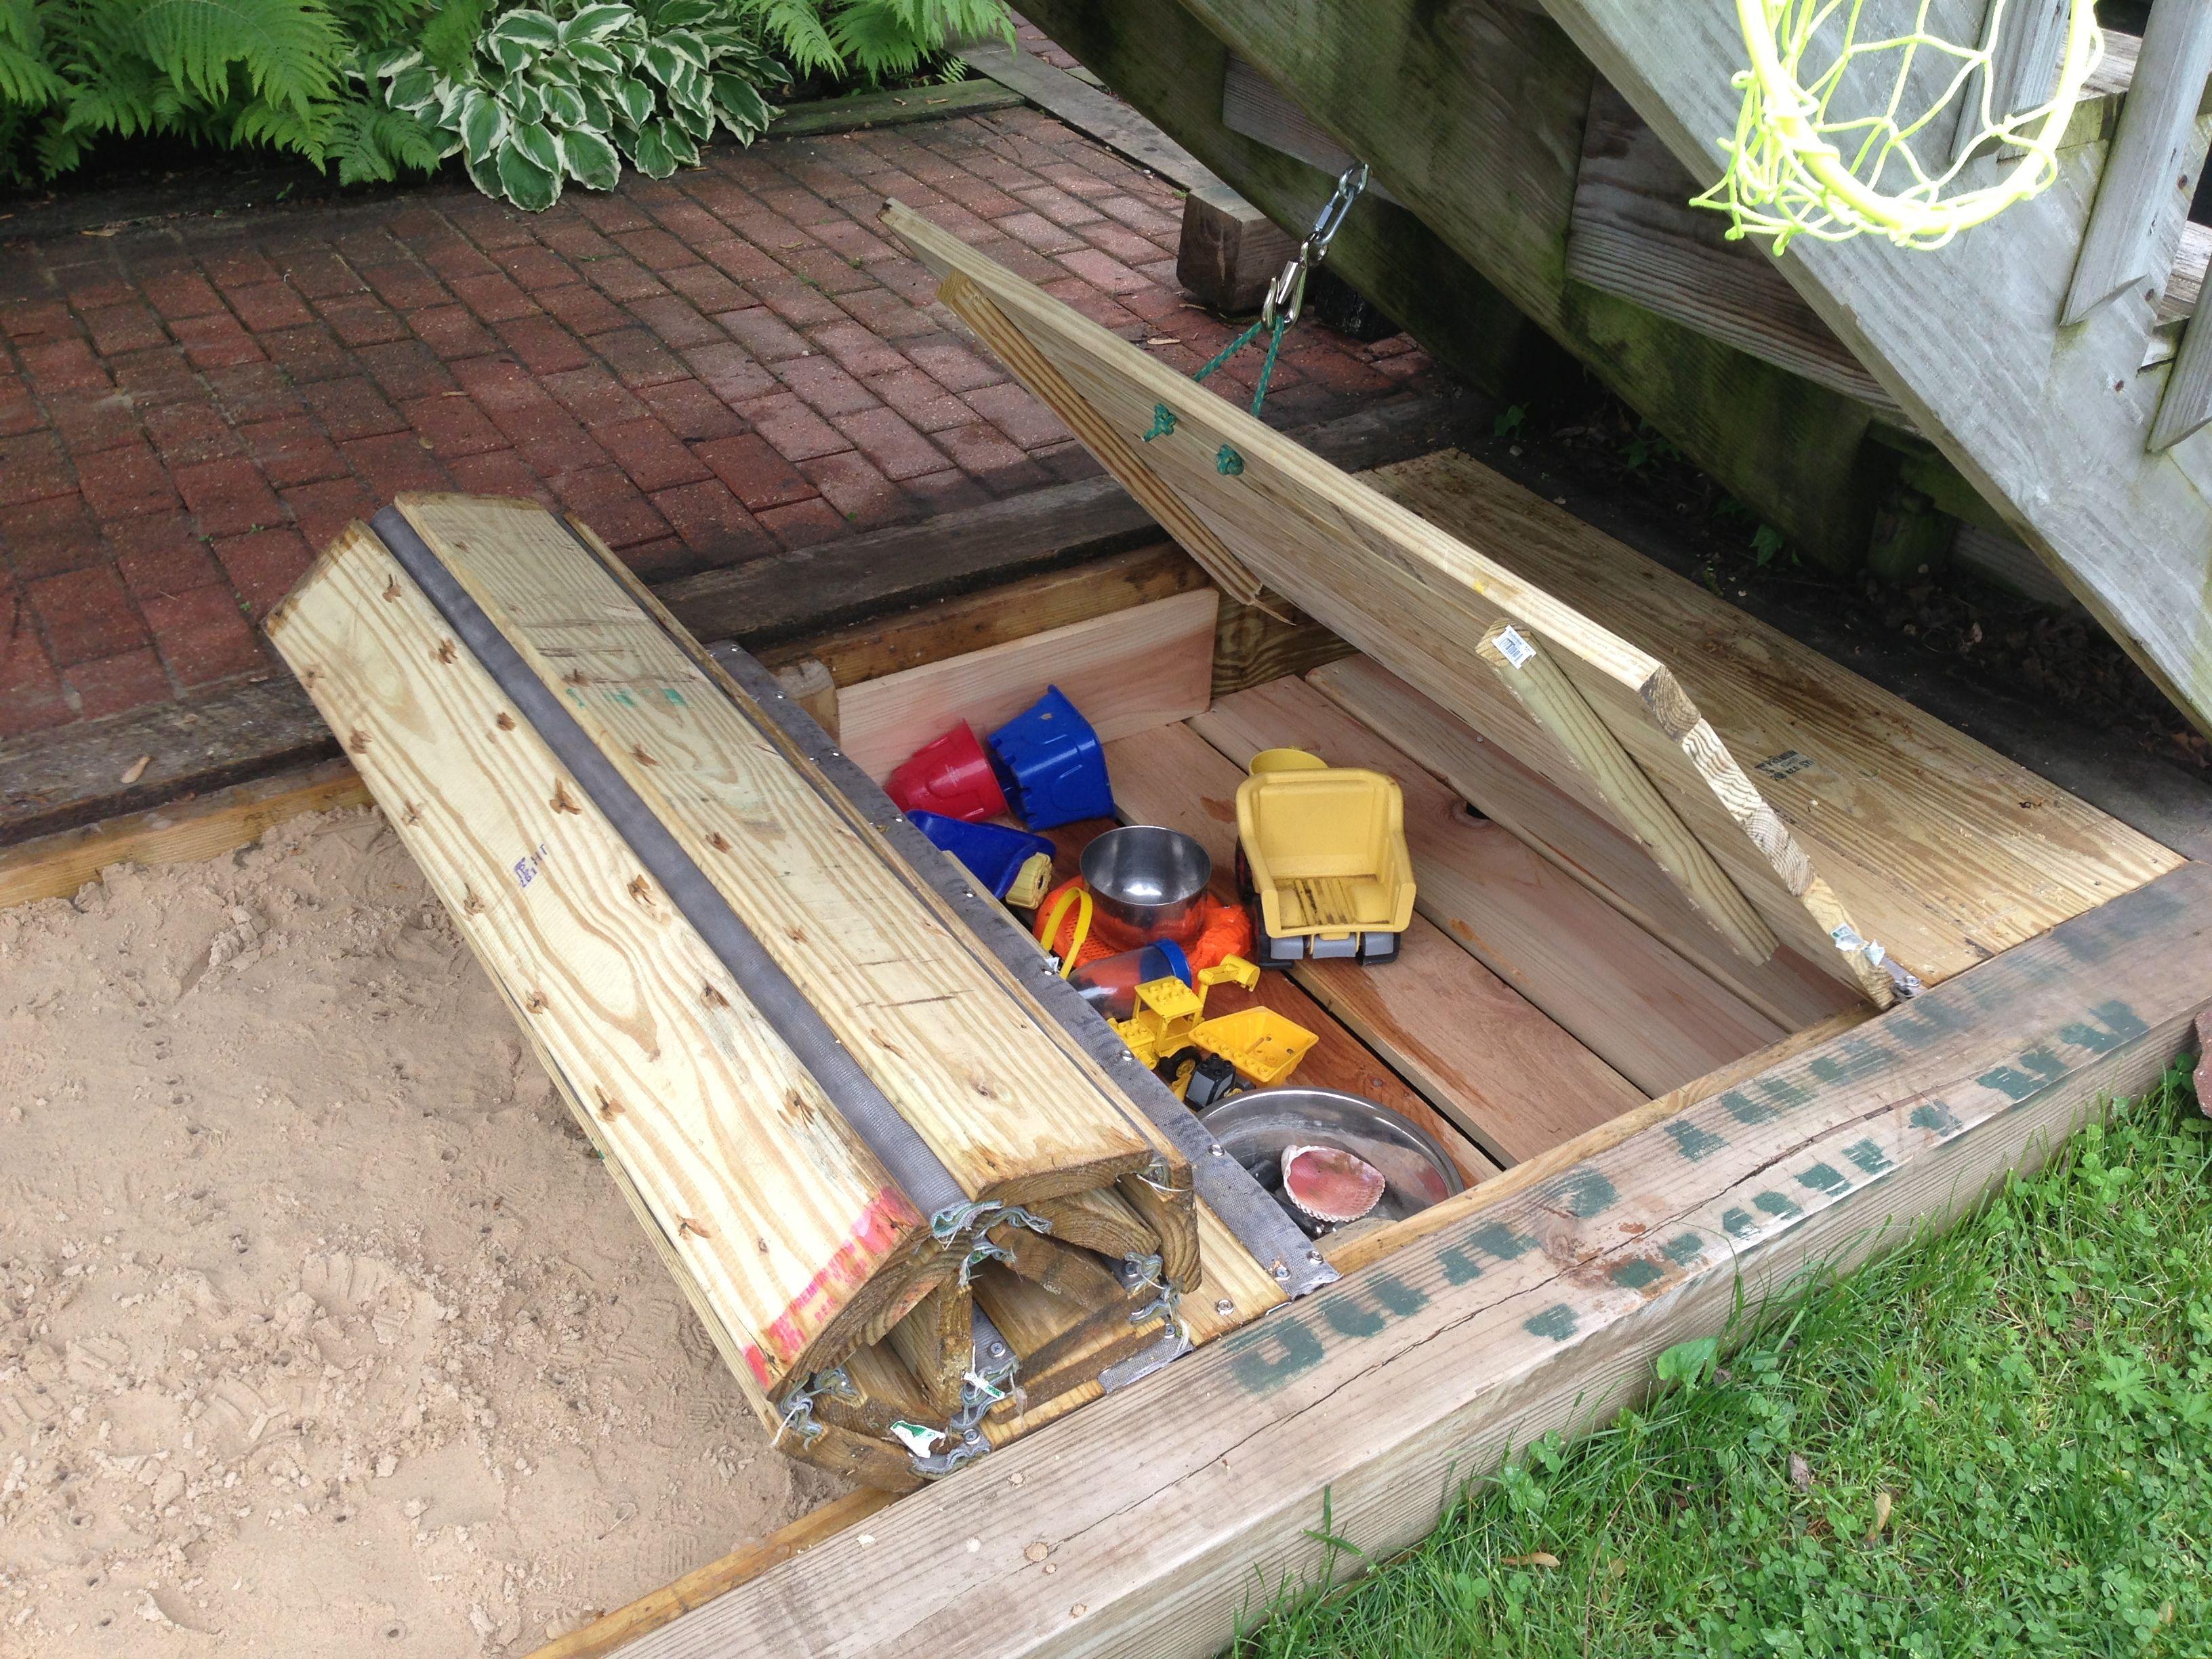 ... sandbox cover w/ toy box | Yard and Garden Ideas | Pinter